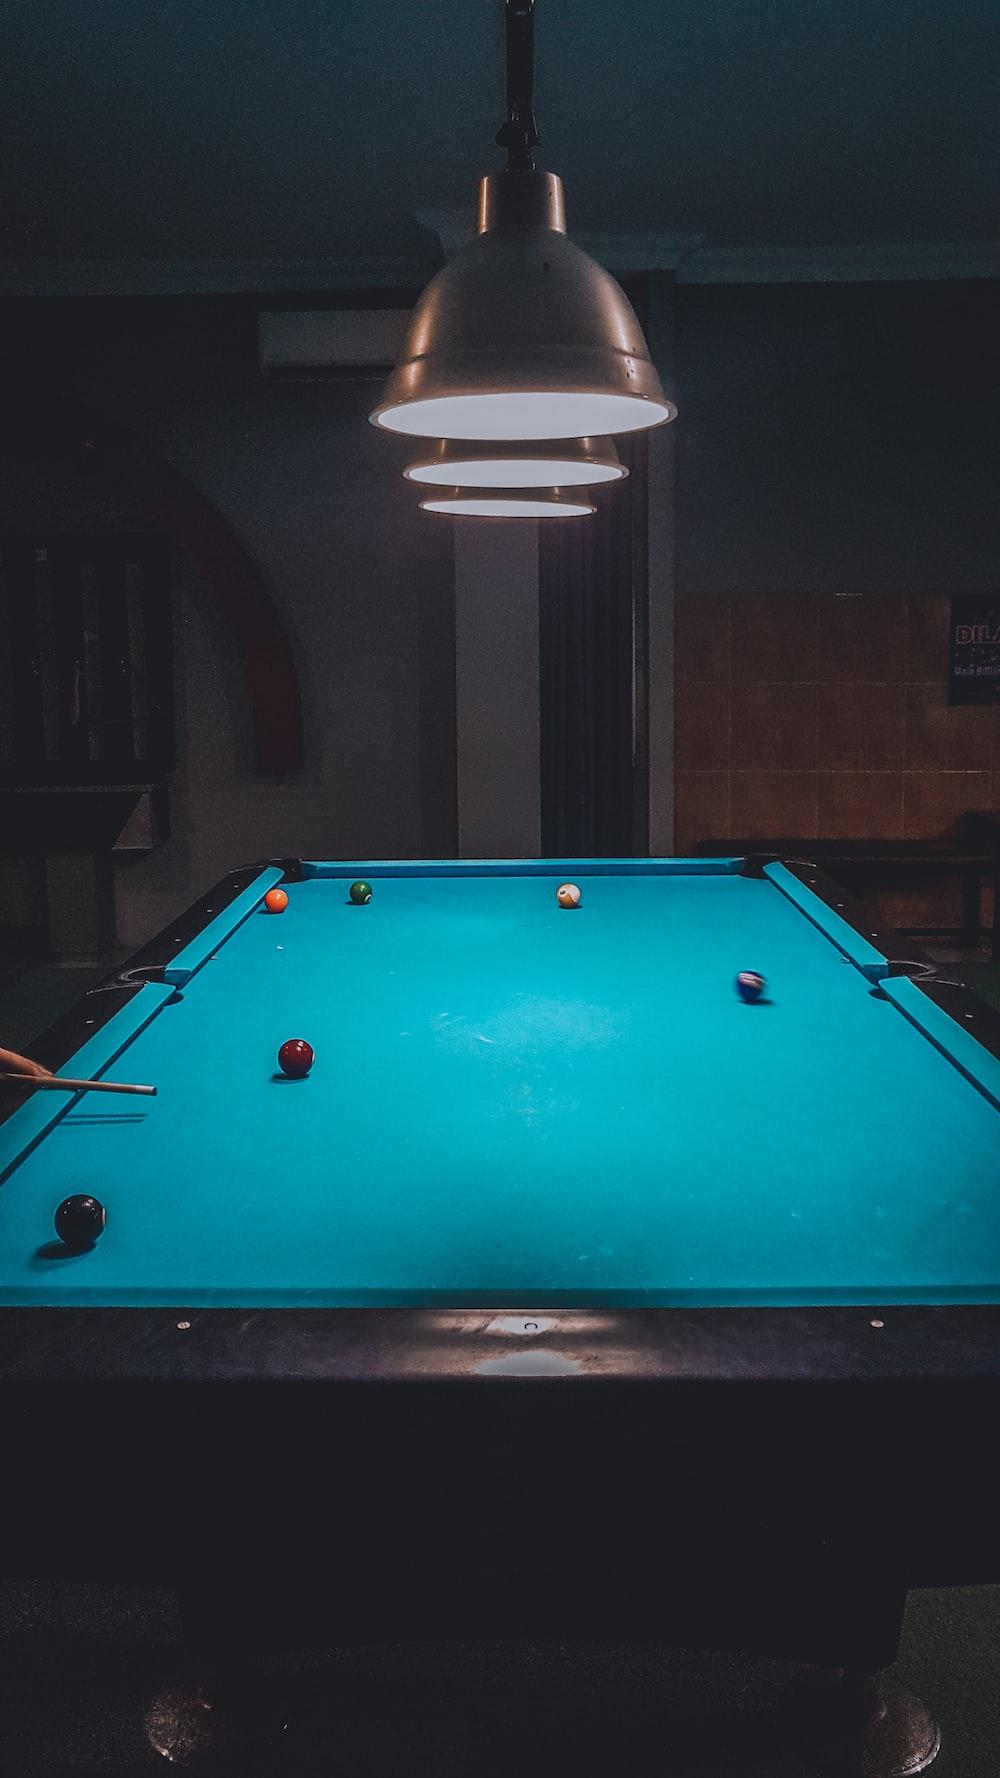 shallow focus photo of blue billiard table